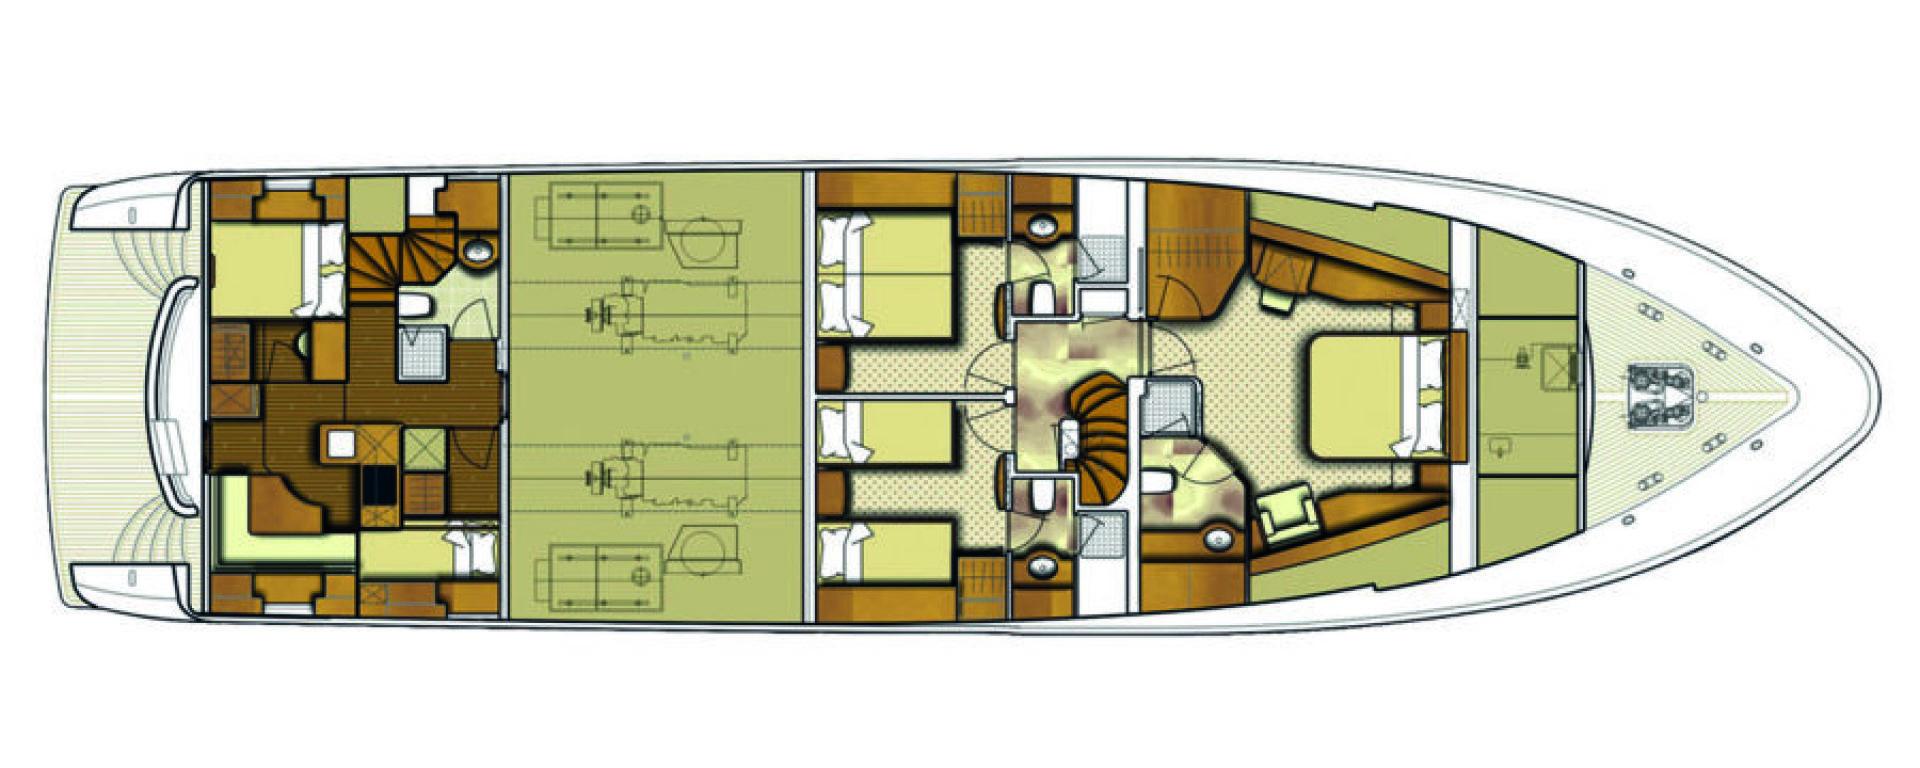 Conrad Shipyard-88 Motor Yacht 2005-Chillin Fort Lauderdale-Florida-United States-Conrad Motor Yacht 2005 Chillin-1537346 | Thumbnail